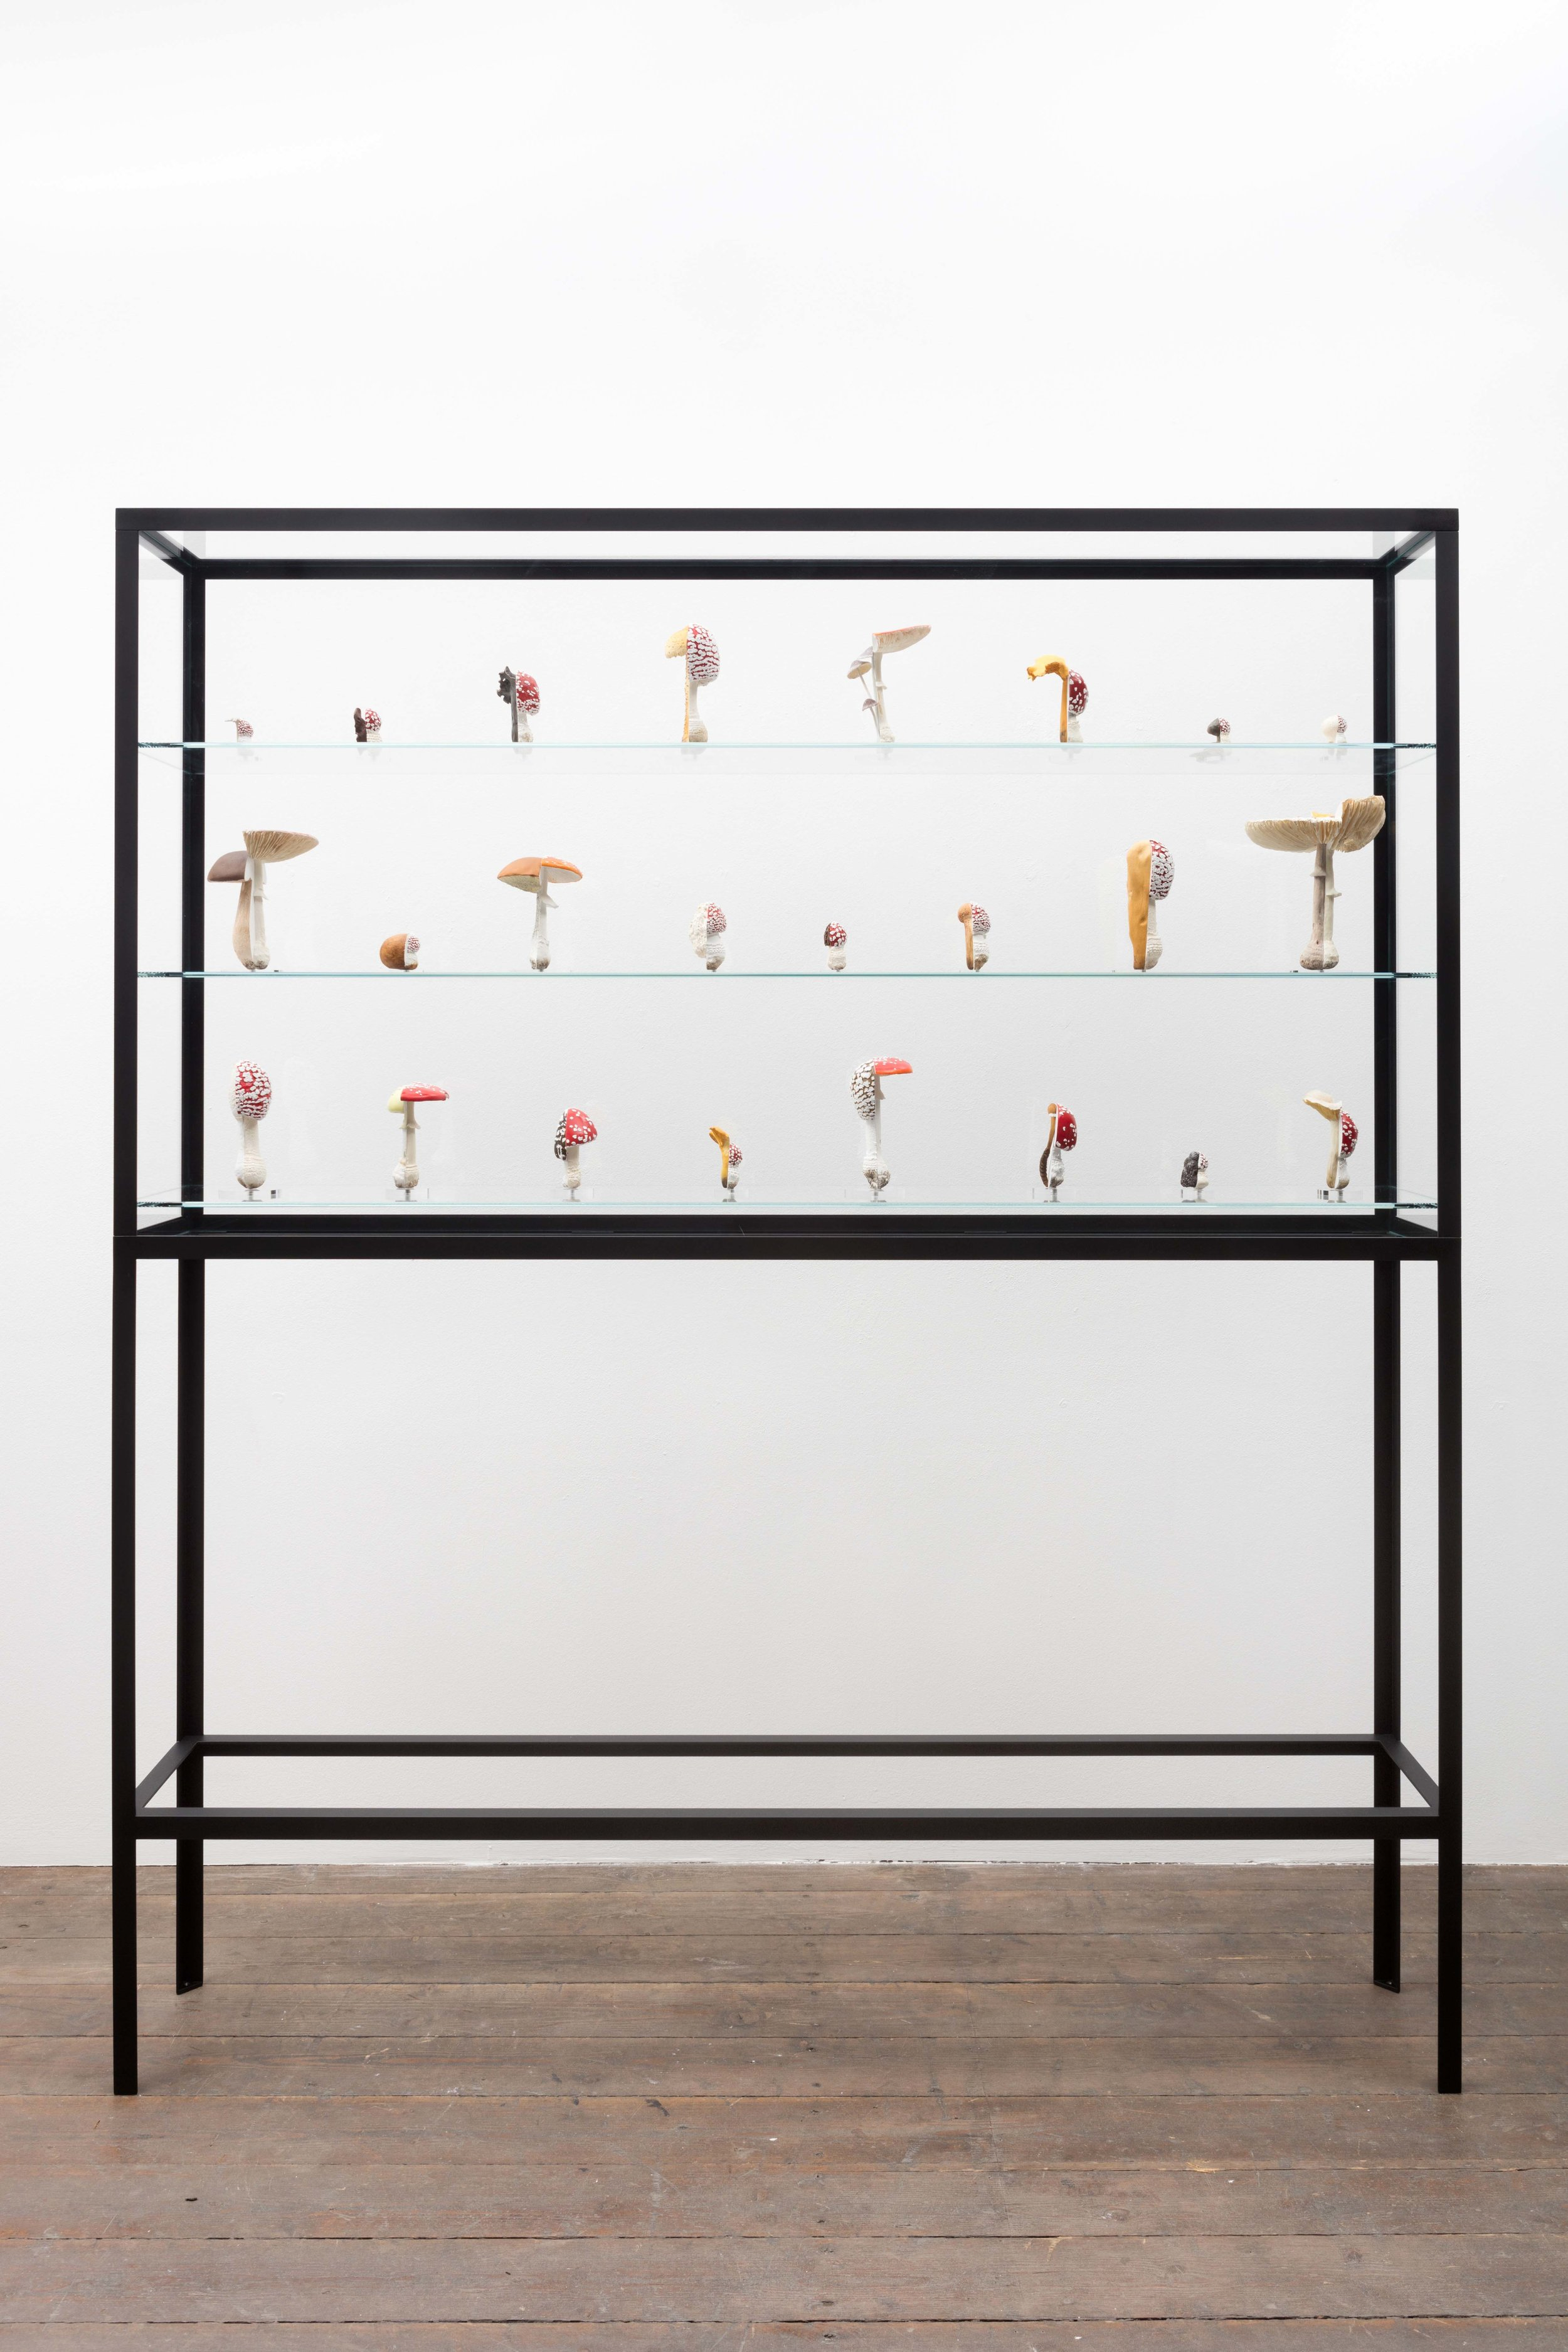 Carsten Höller   Double Mushroom Vitrine (Twenty-Fourfold)  2016 Cast polyurethane mushroom replicas in various sizes, acrylic paint, glass discs, metal pins, vitrine glass, powder-coated metal framework. Unique 145 x 175 x 25 cm